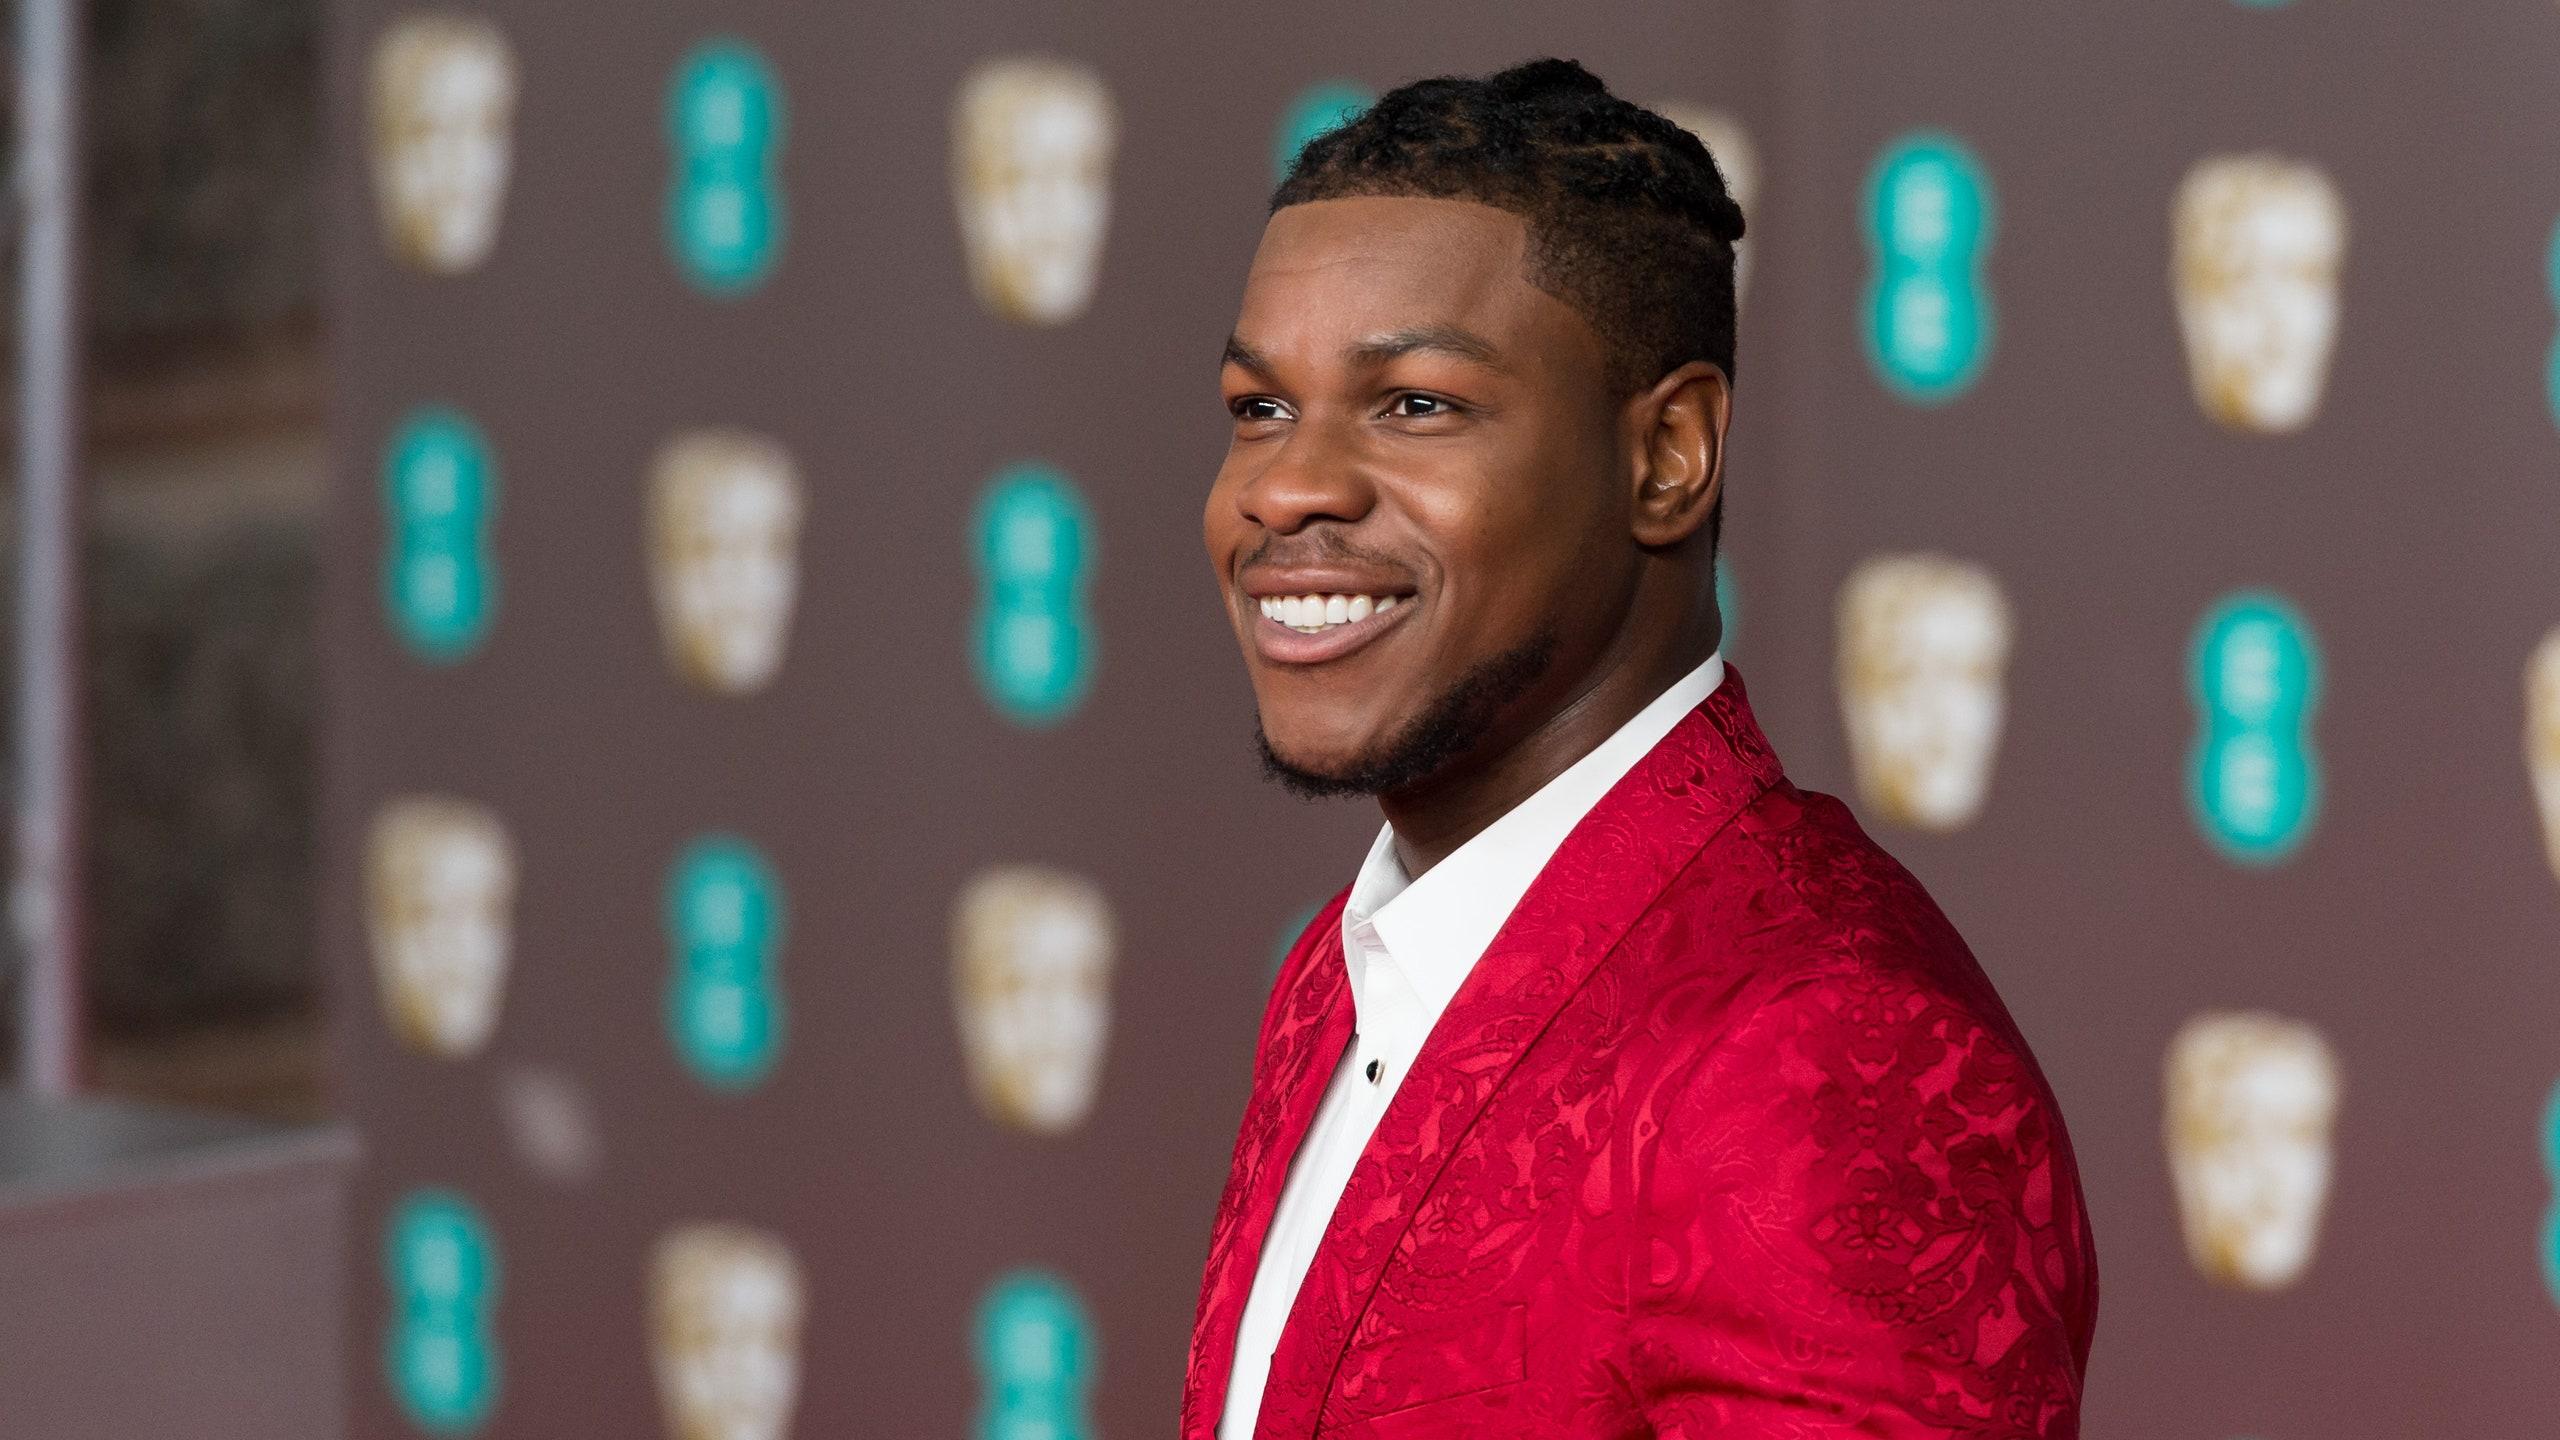 Star Wars Actor John Boyega Partners With Netflix to Make Films 2560x1440